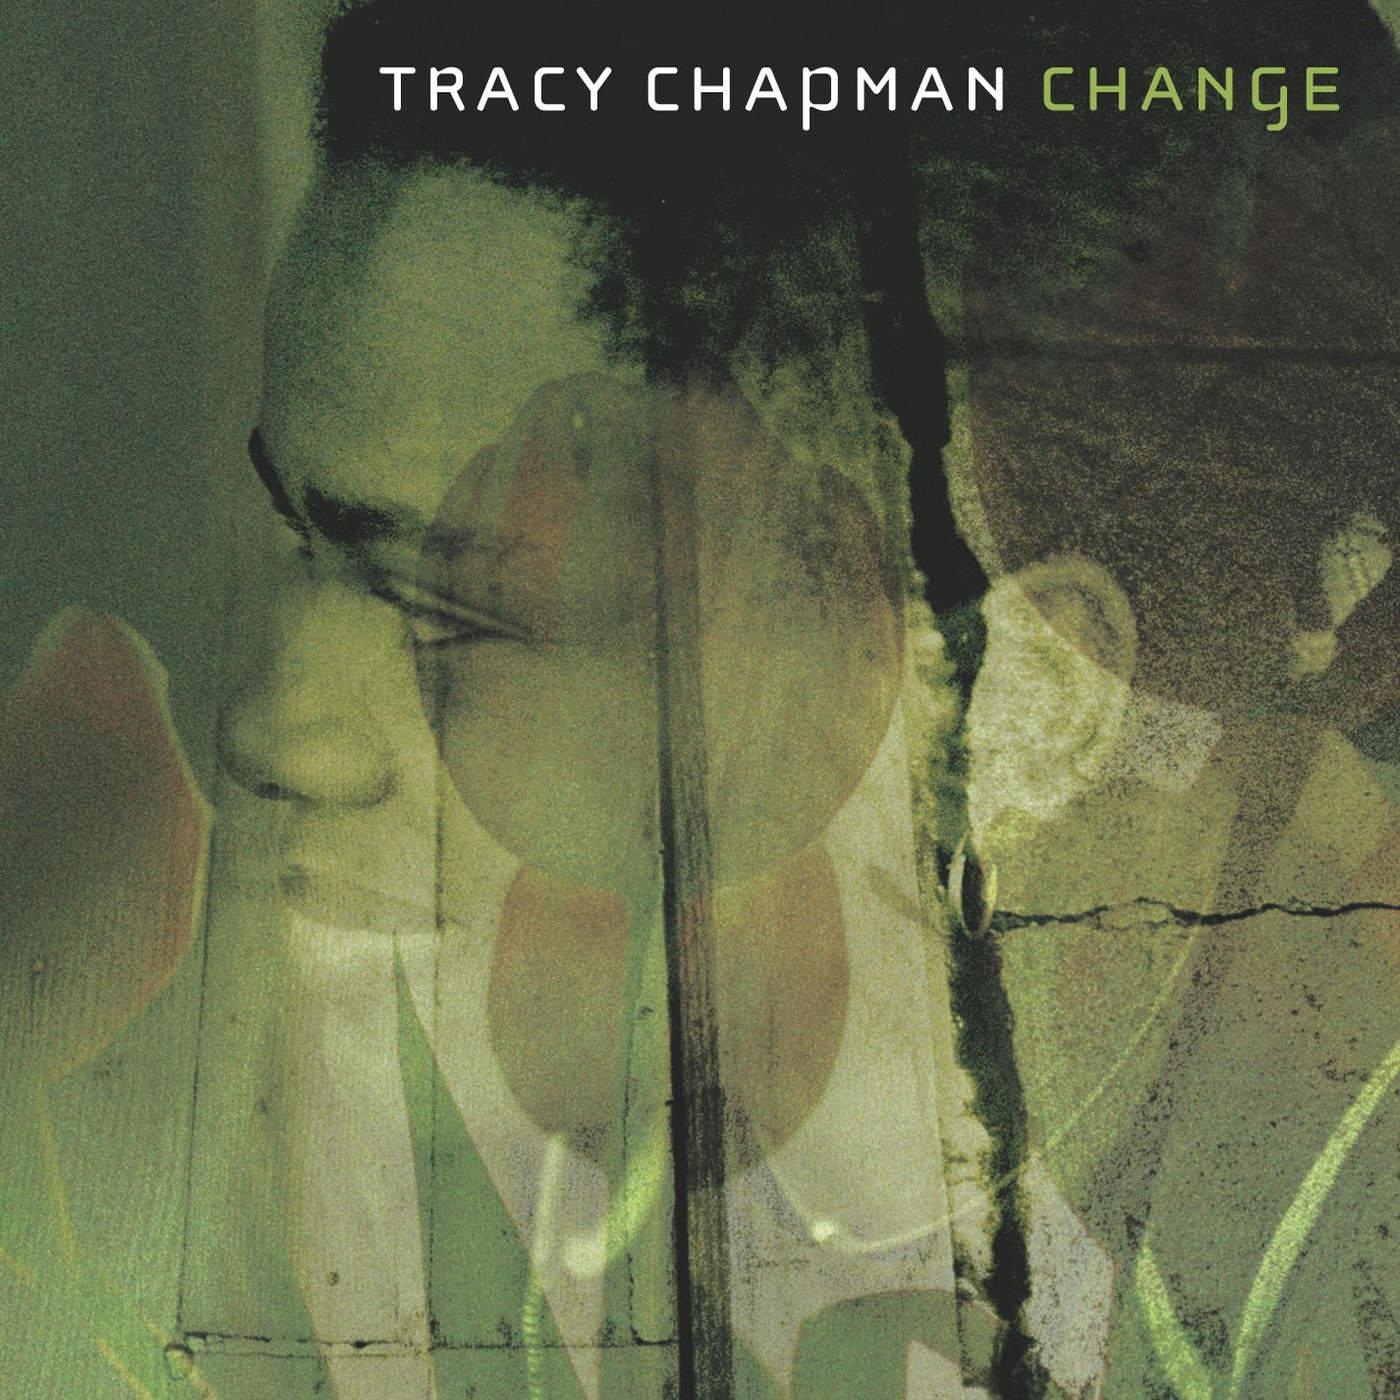 Tracy Chapman - Change - Single